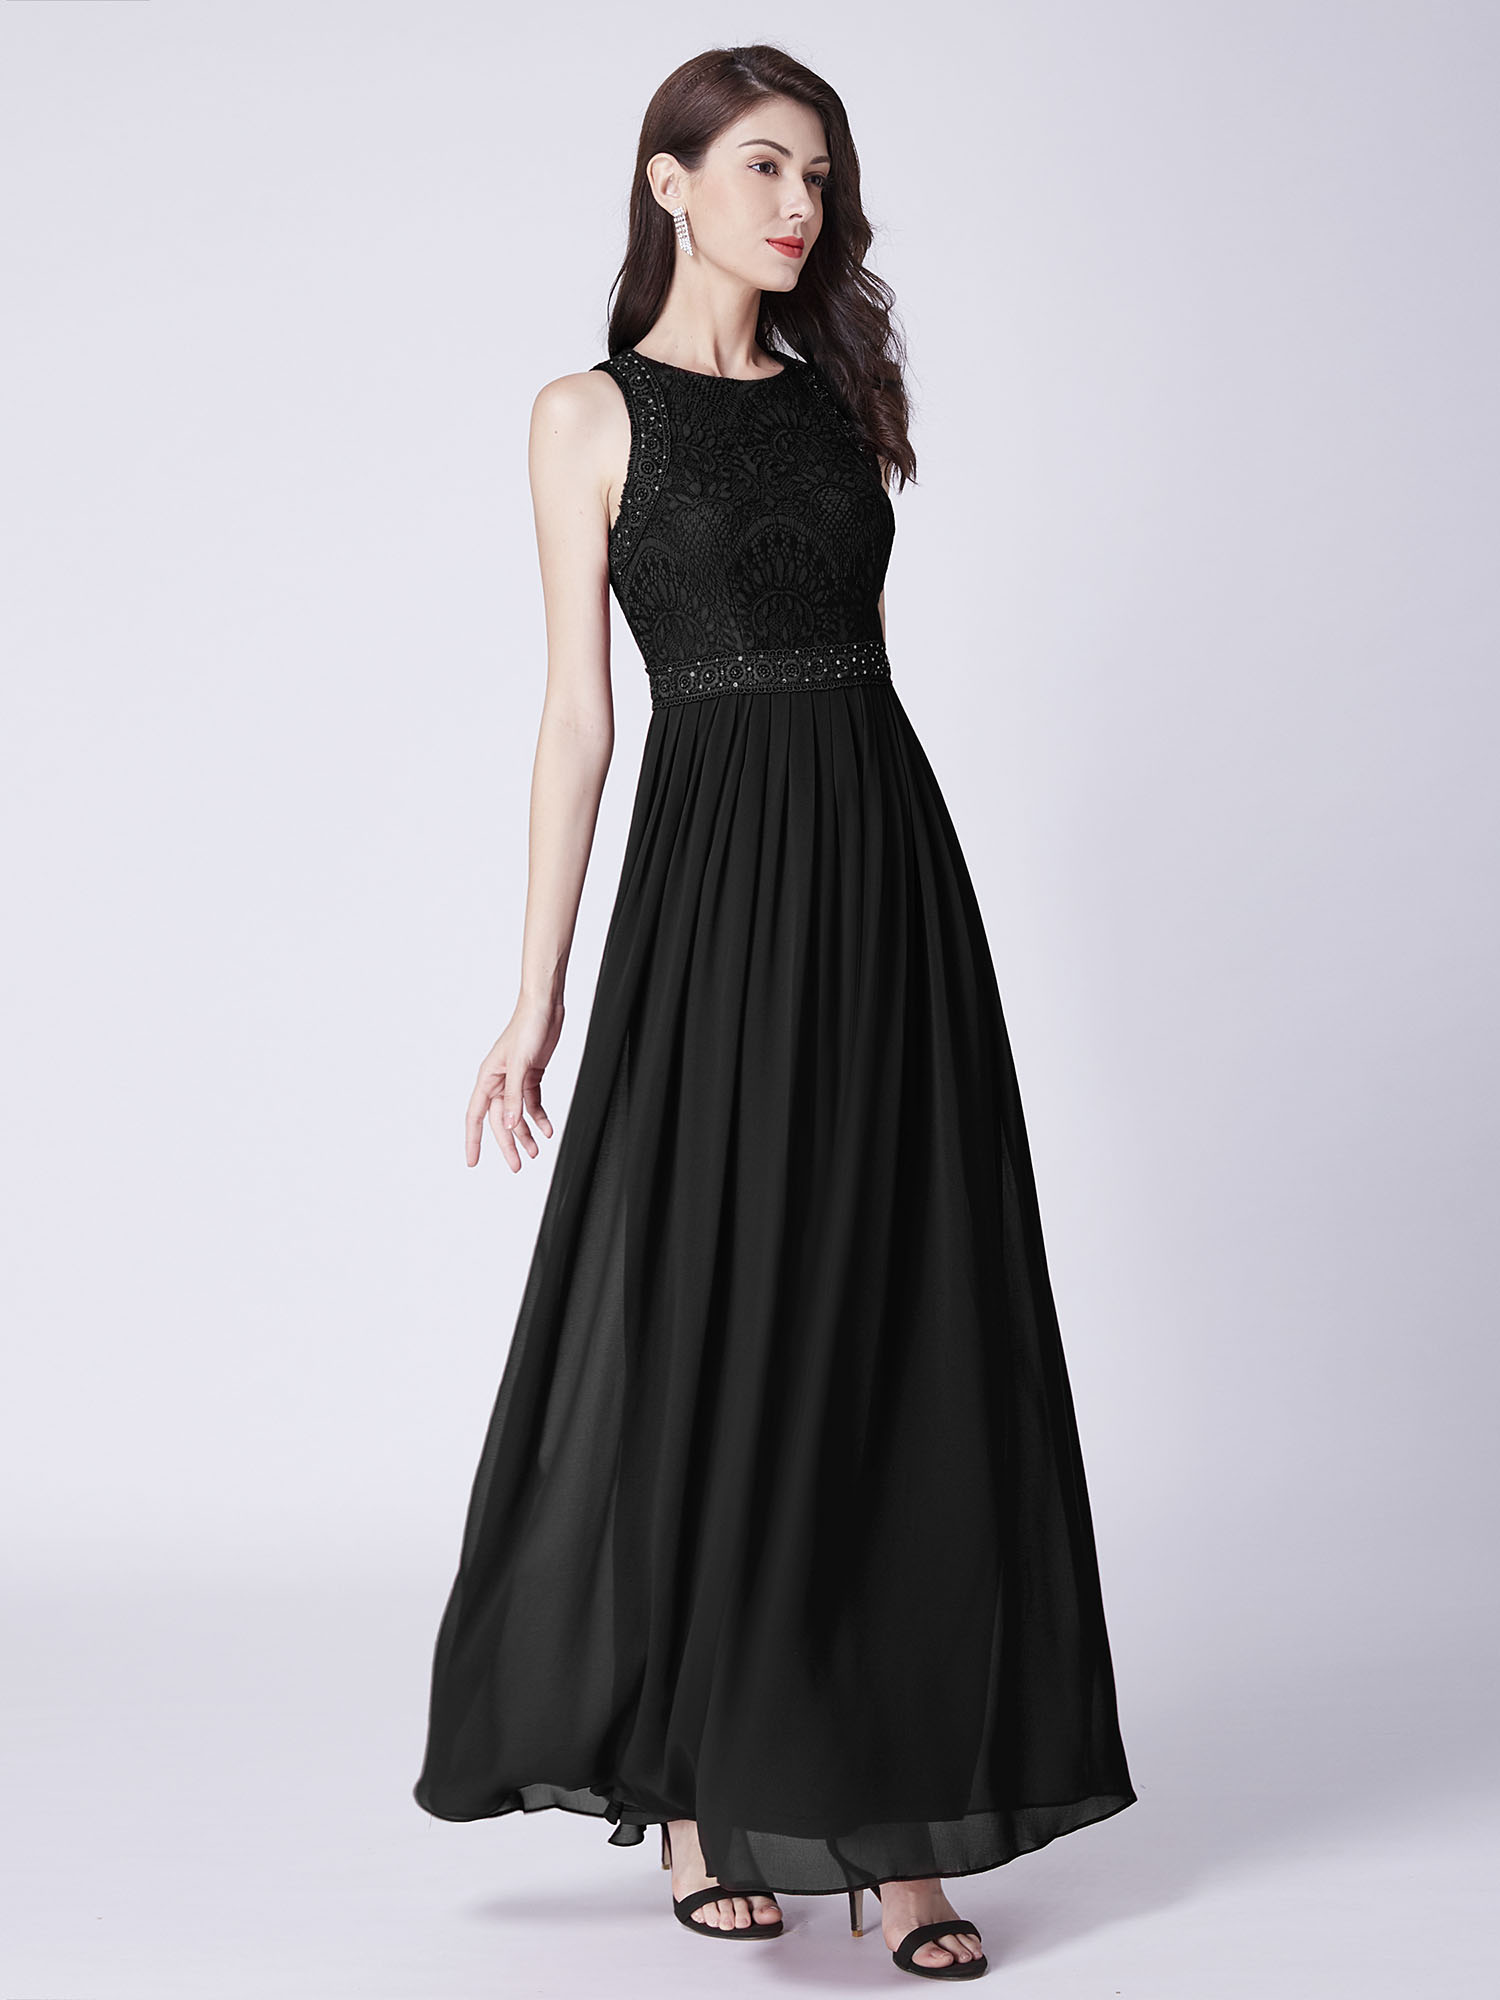 b858d0c81b3 Black Tie Event Dresses Dillards - Gomes Weine AG